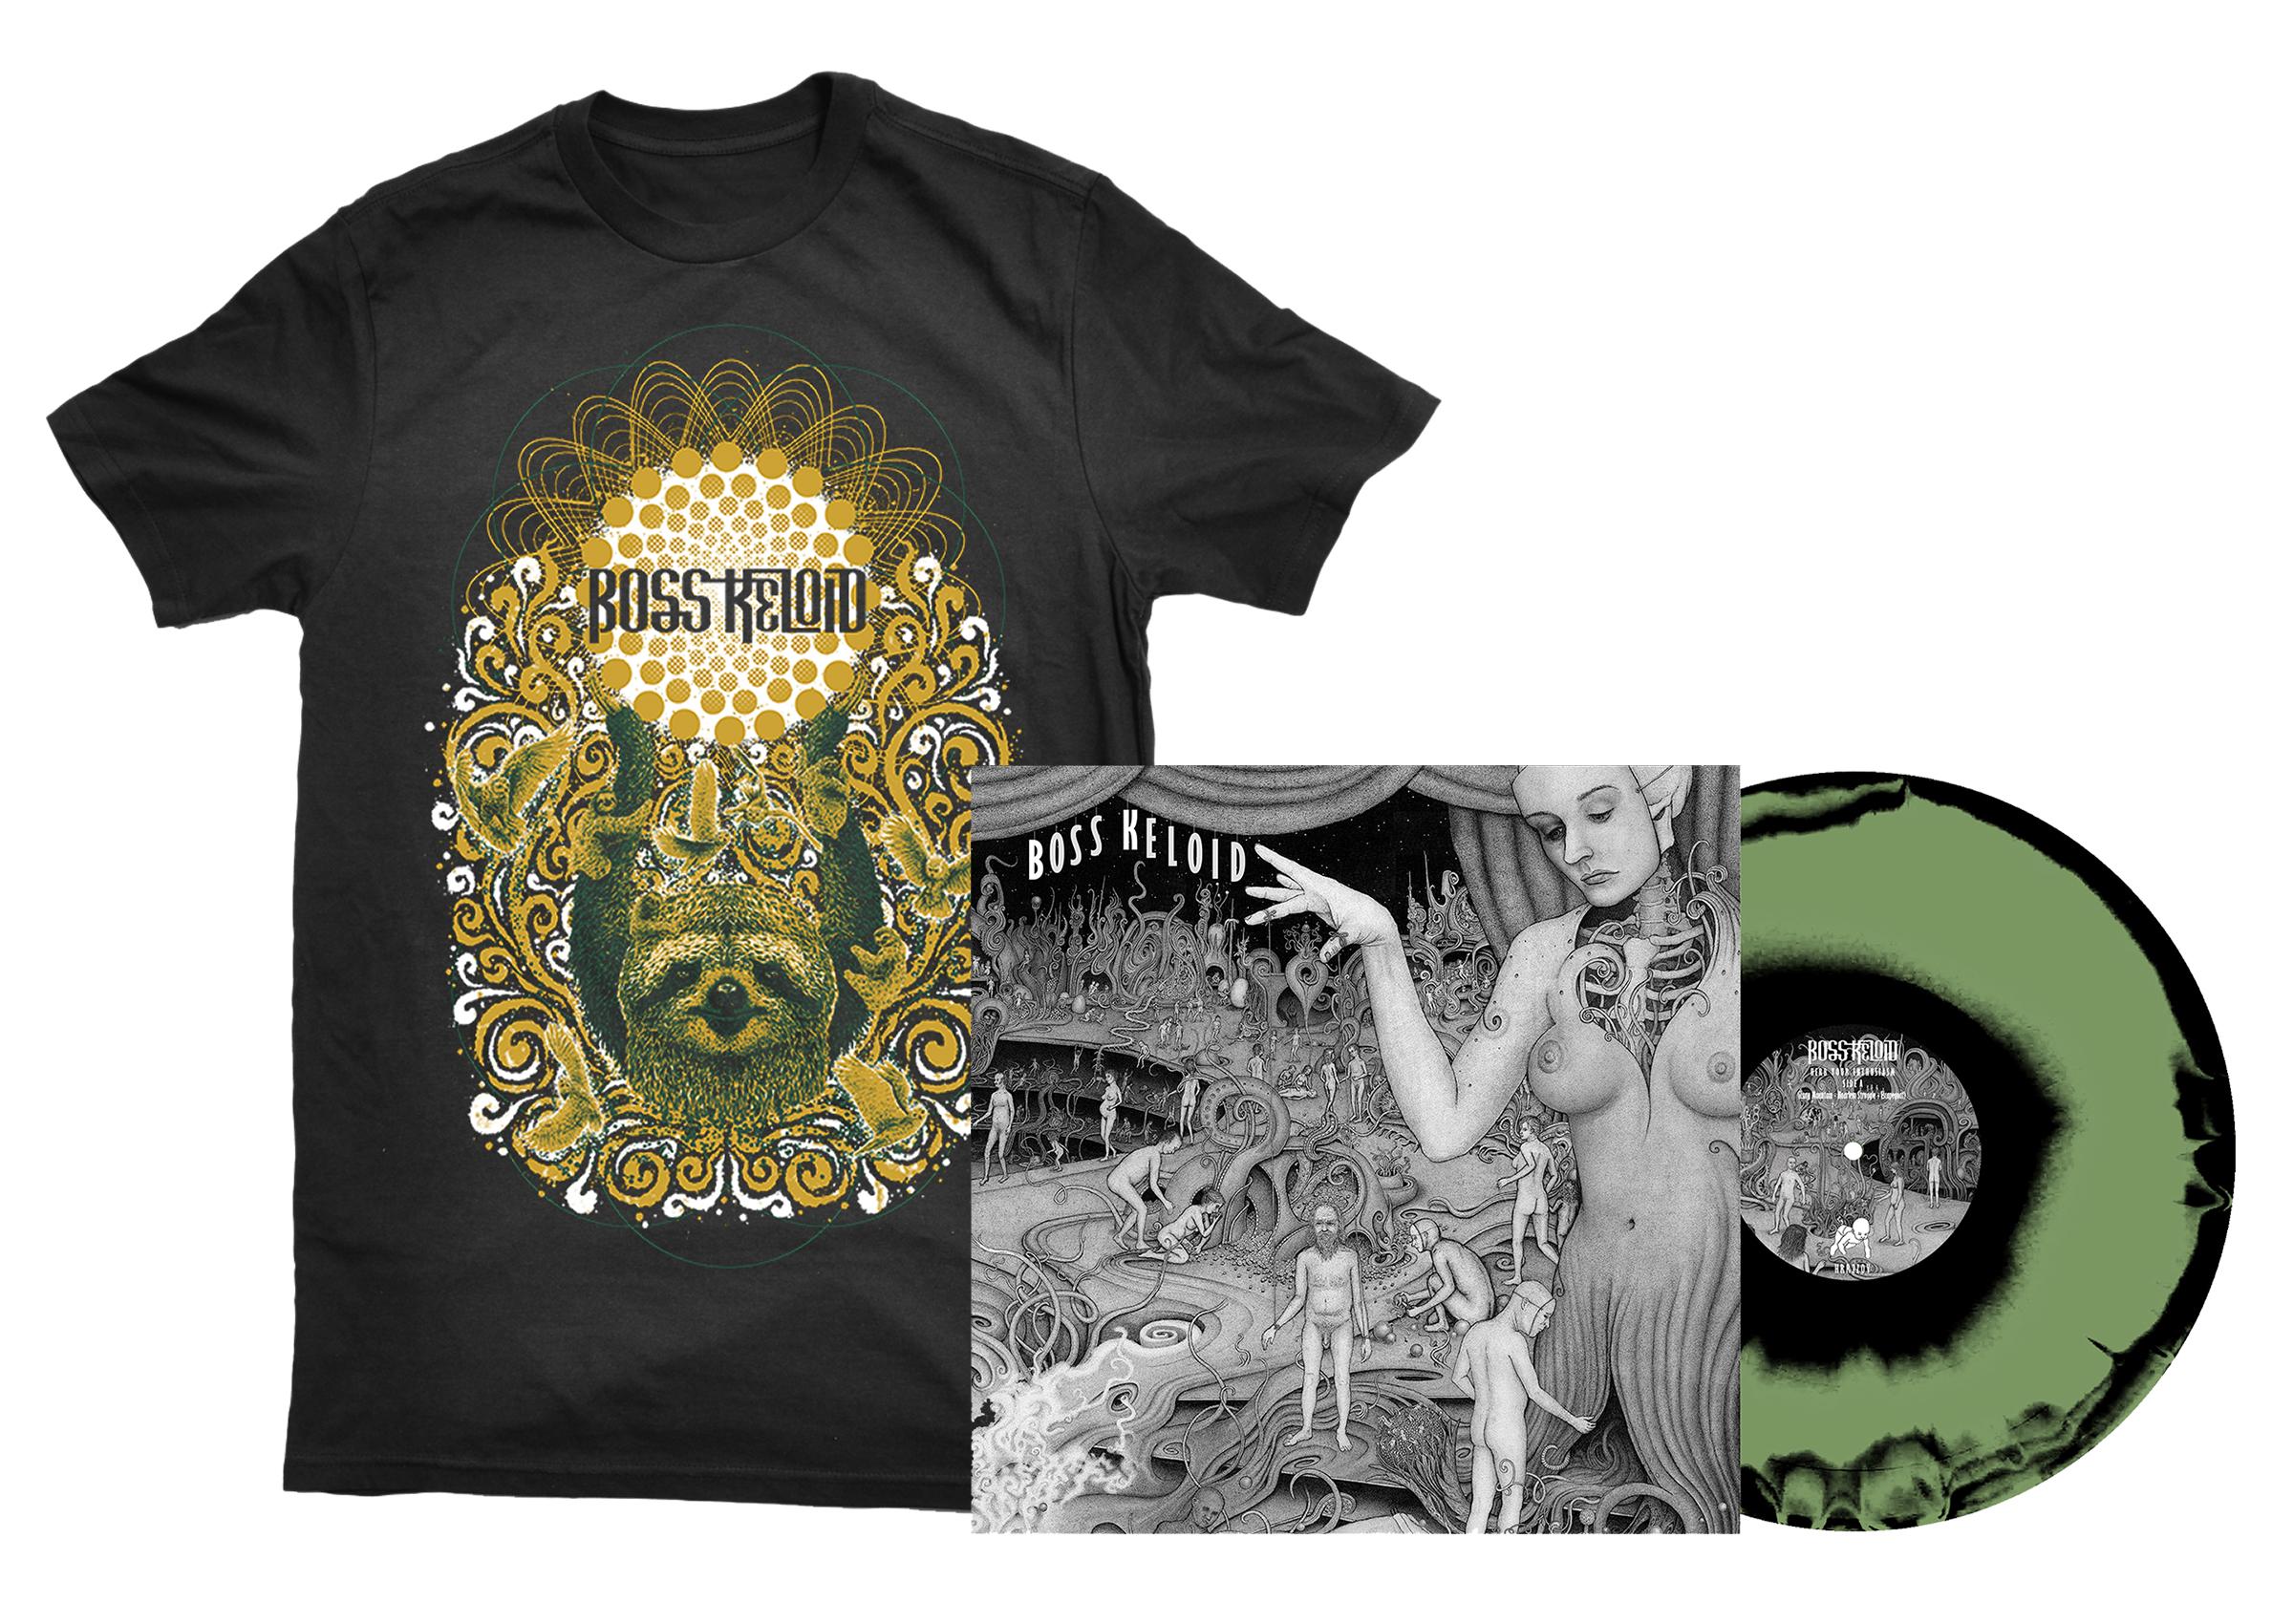 Boss Keloid - Herb Your Enthusiasm shirt + 2xLP PREORDER